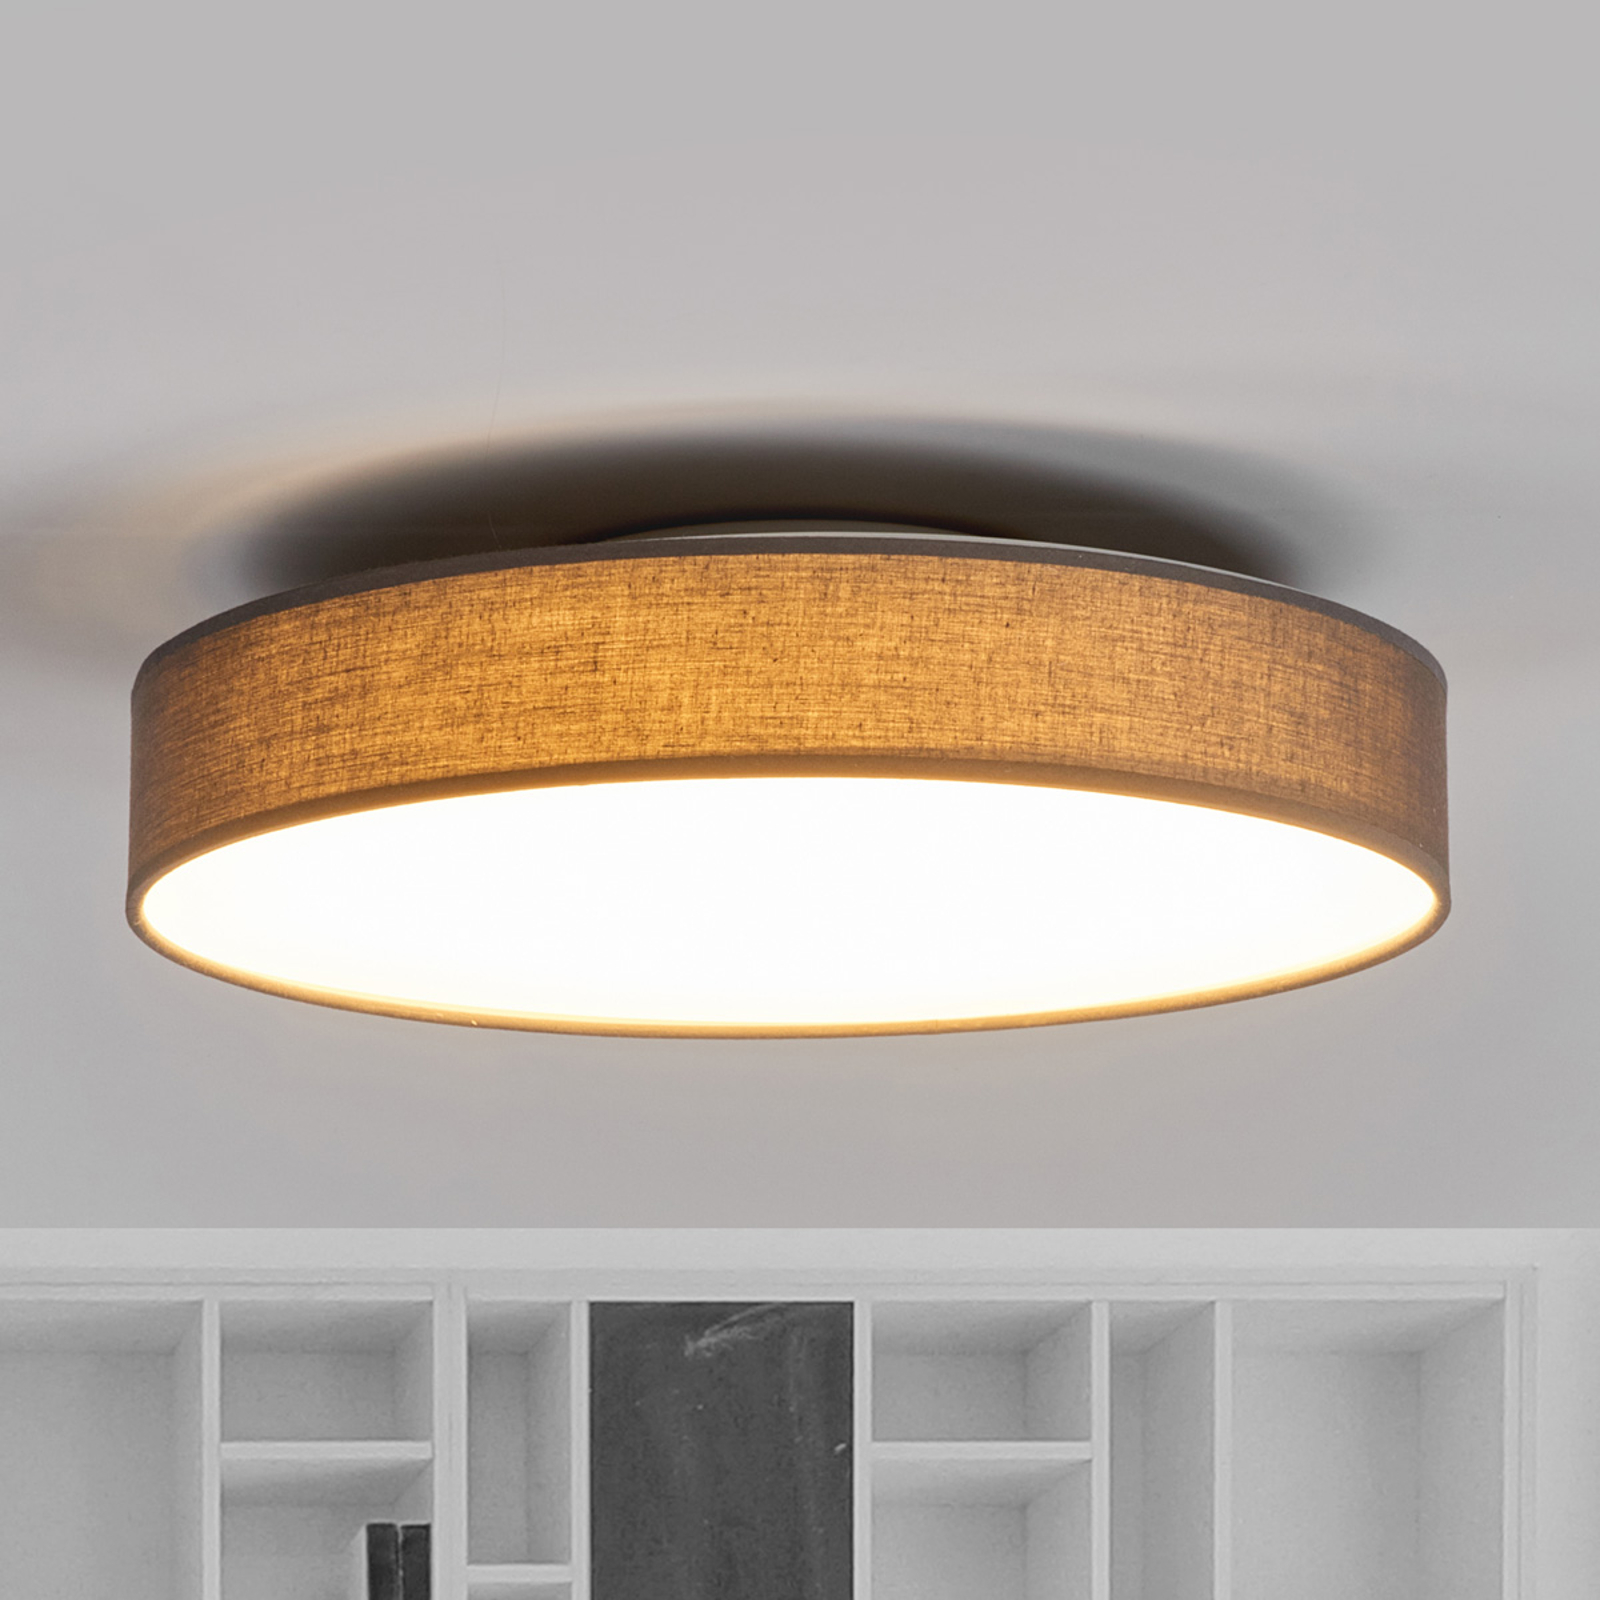 Stoffen LED-plafondlamp Saira, 40 cm, grijs